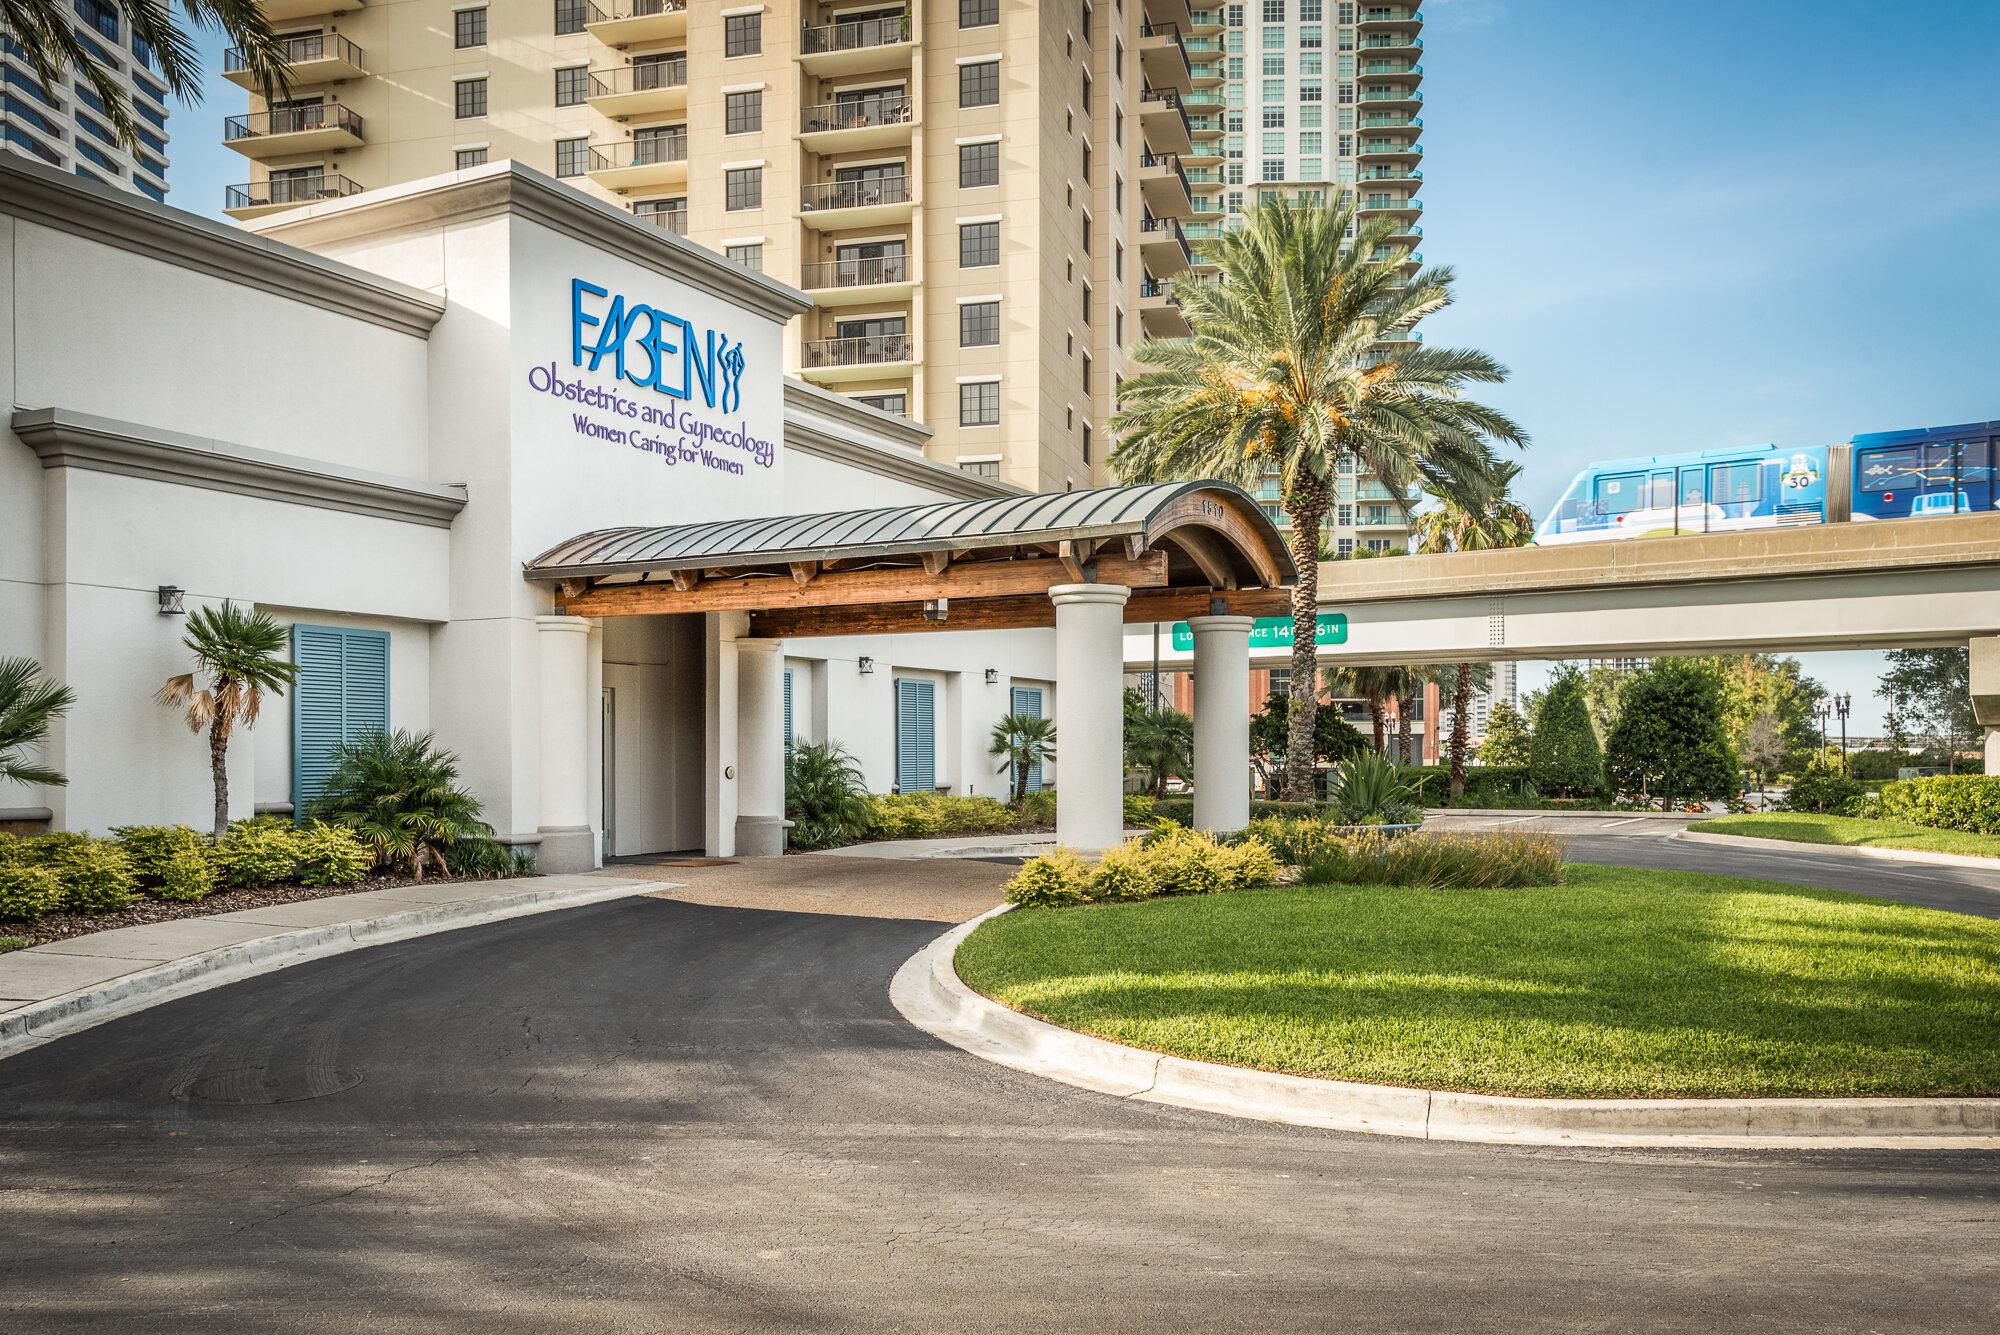 Micamy Design Studio_Interior Design_Faben Obstetrics and Gynelcology_North Florida_Riverplace_San Marco_Healthcare_Office_Medical_Exterior_Entrance_Facade_Architectural (2).jpg